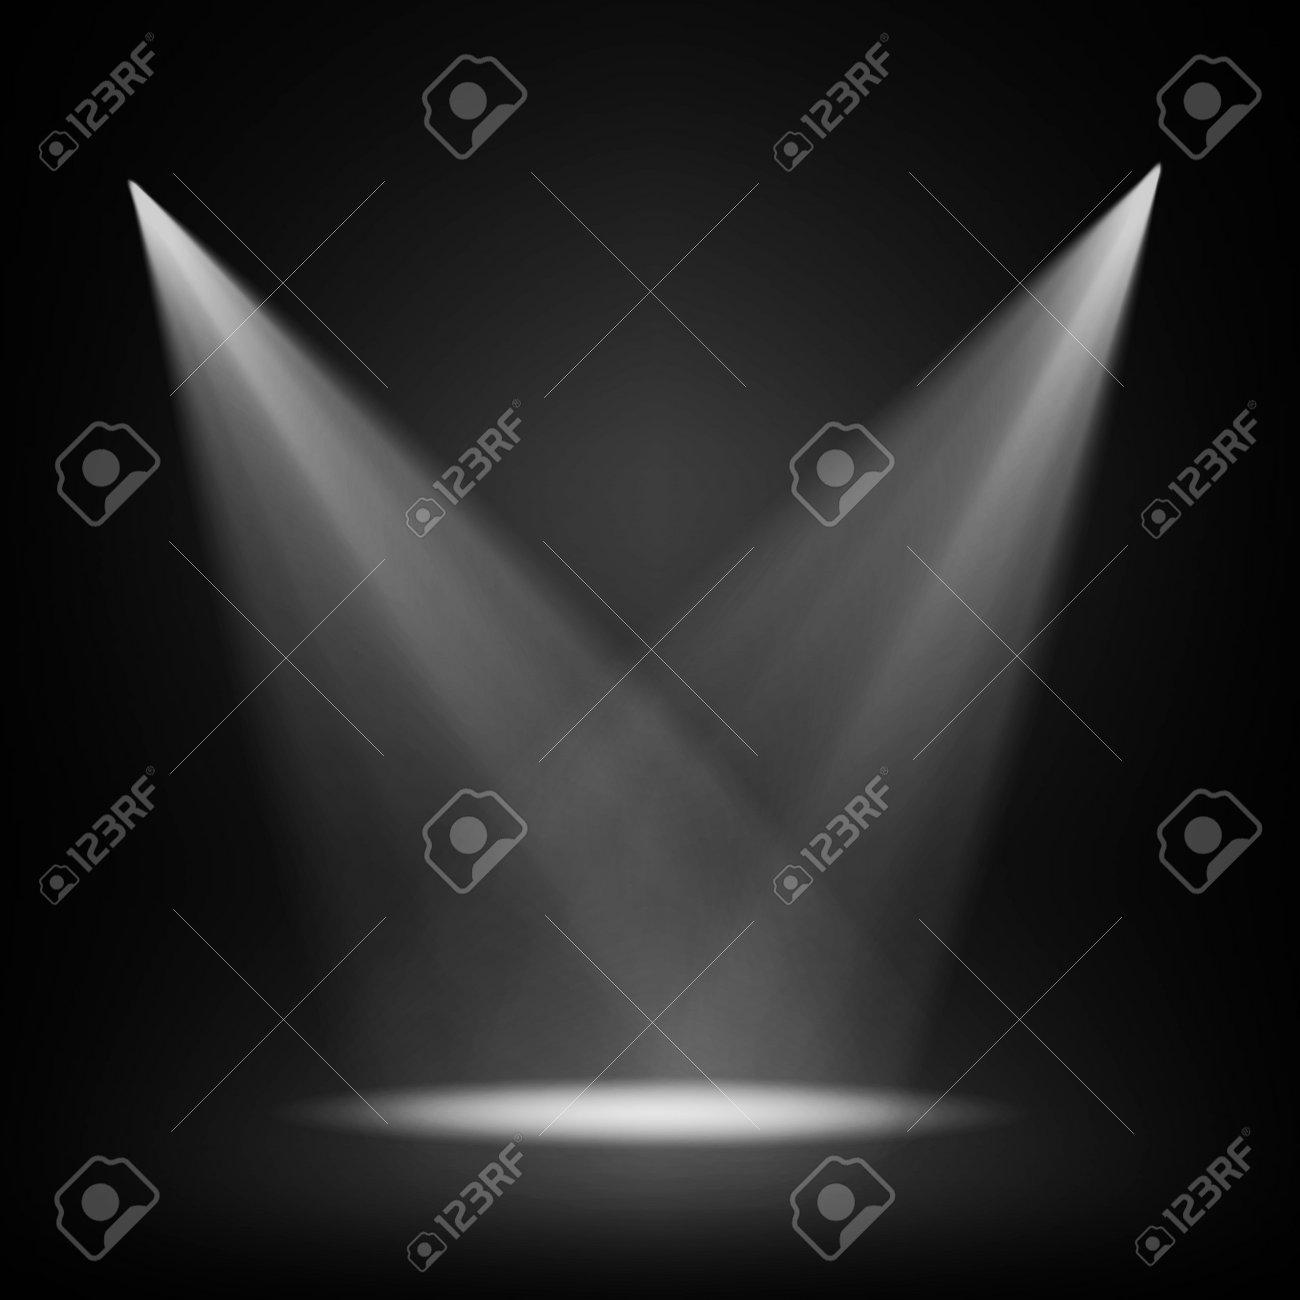 Spotlight on black background - 165659051